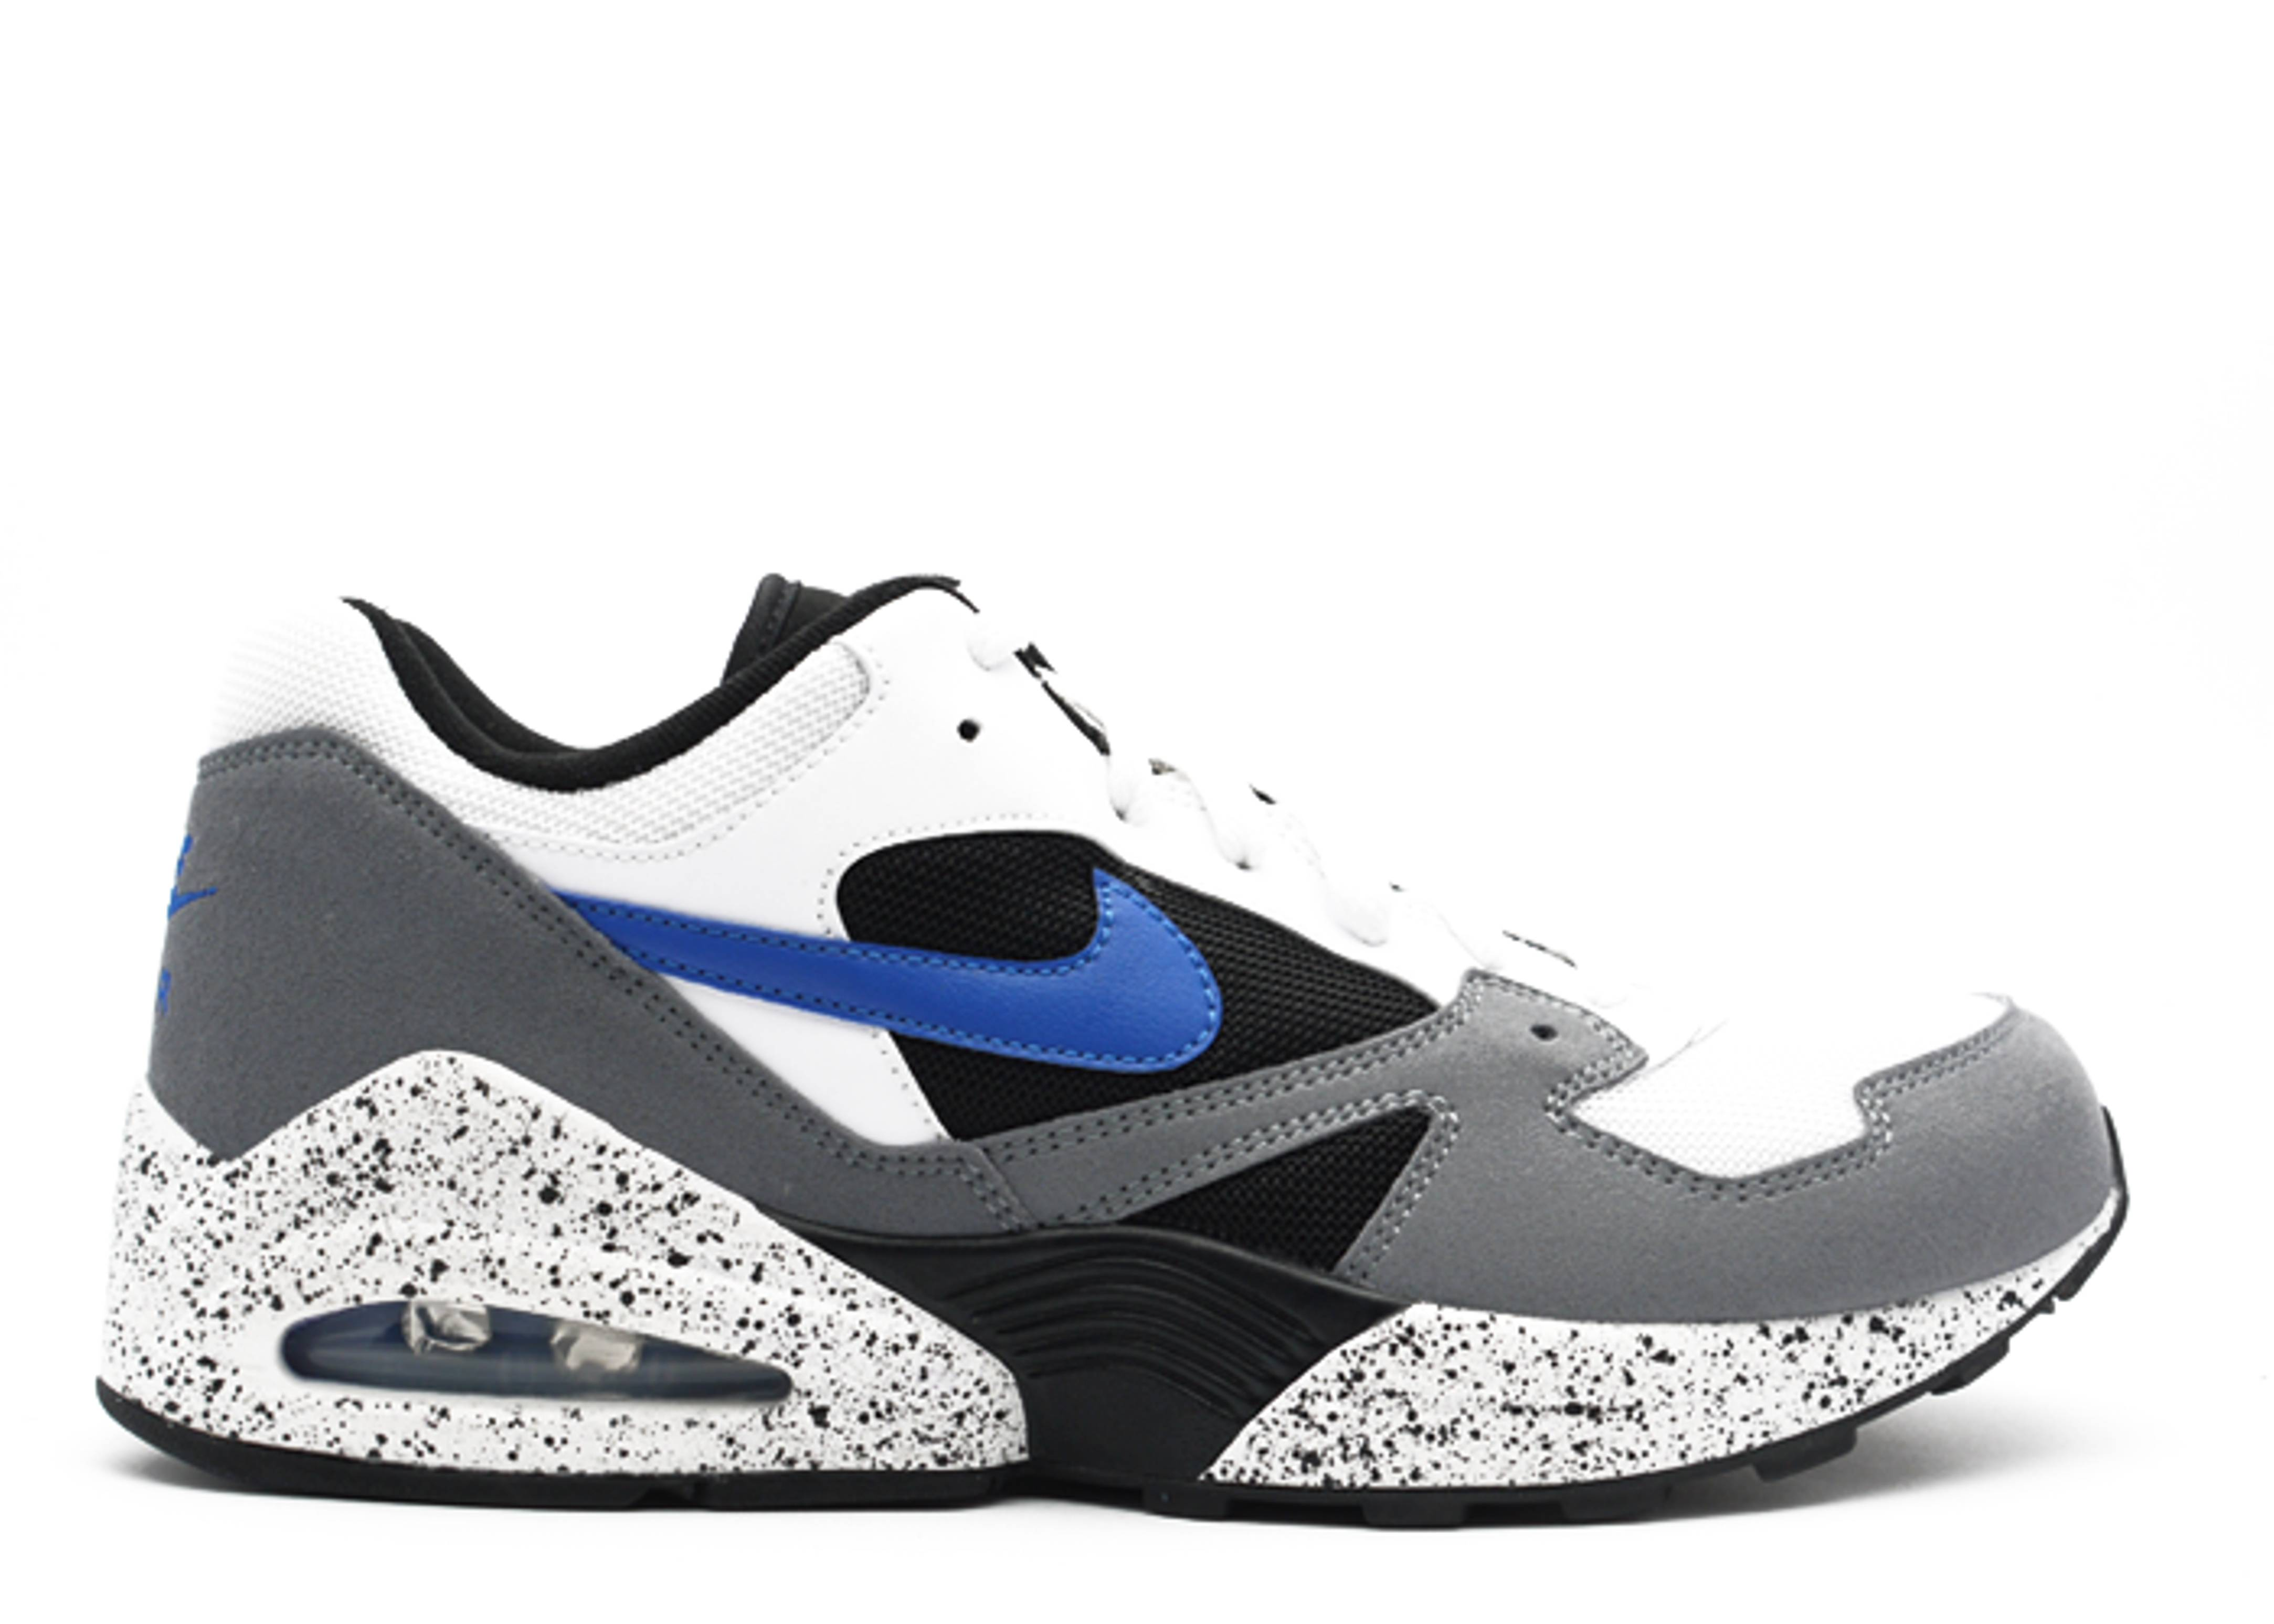 556b730136af Air Tailwind 92 - Nike - 336611 141 - white vrsty ryl-blck-flnt gry ...